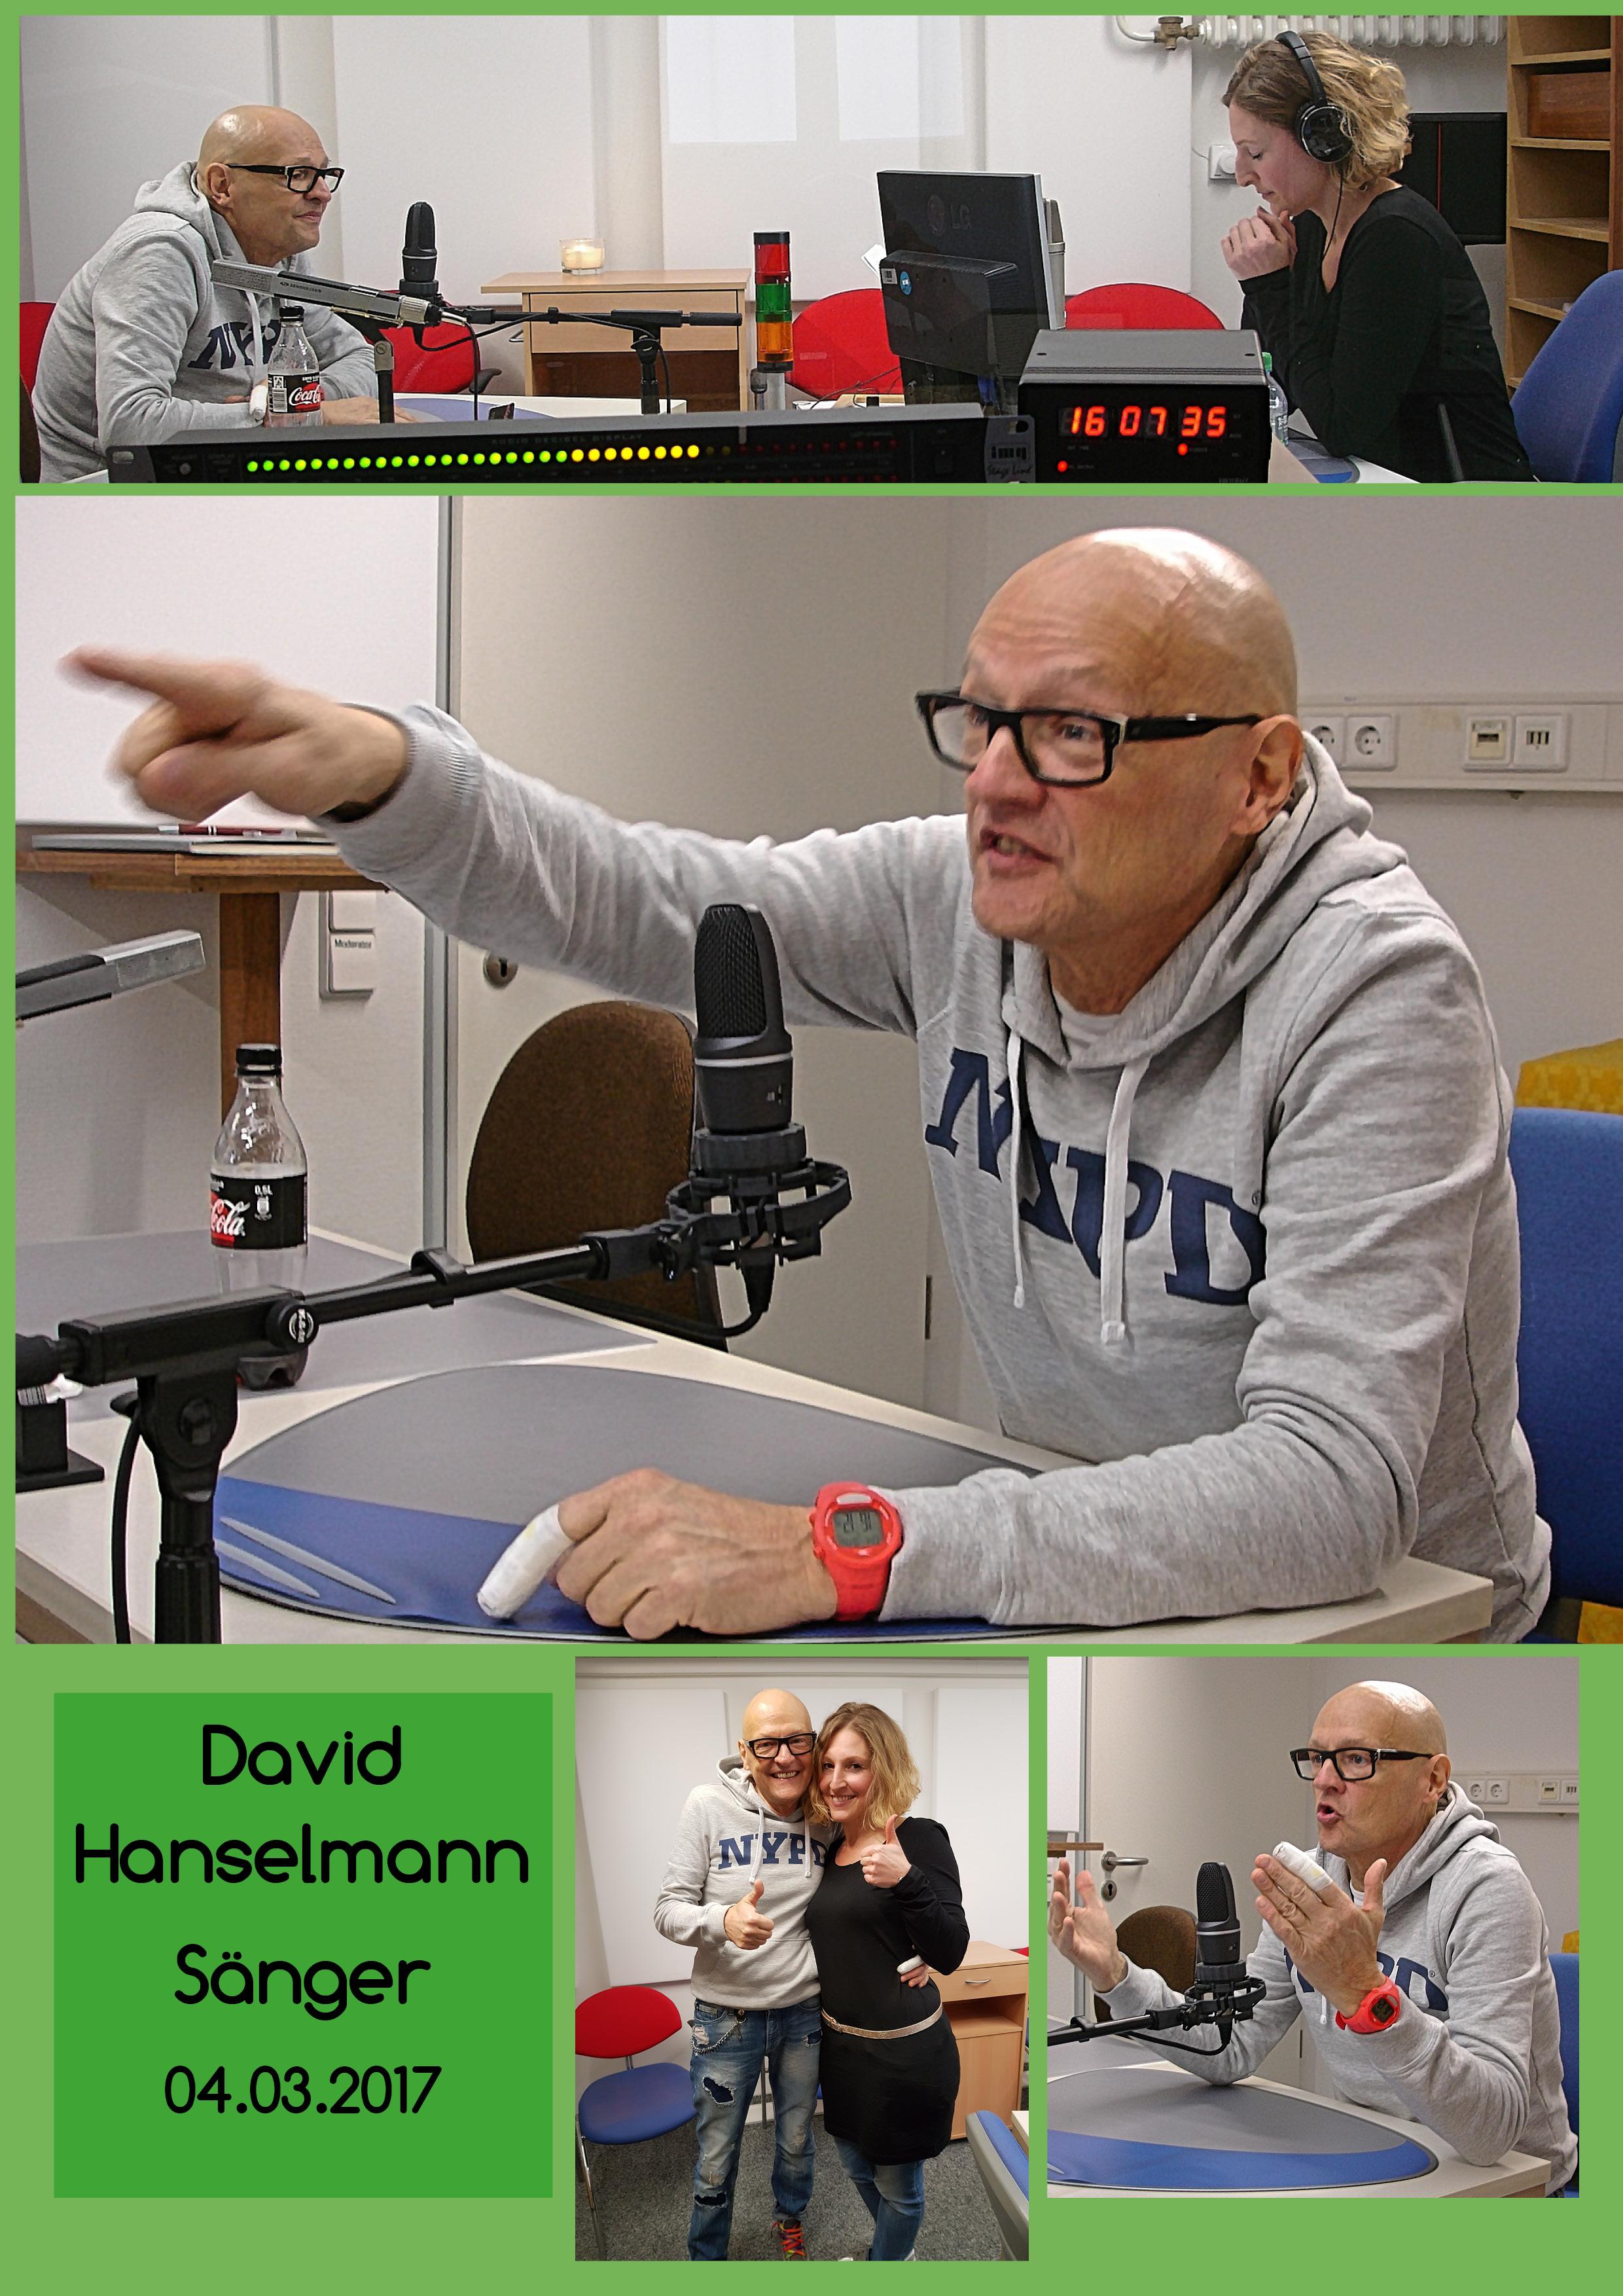 04.03. David Hanselmann